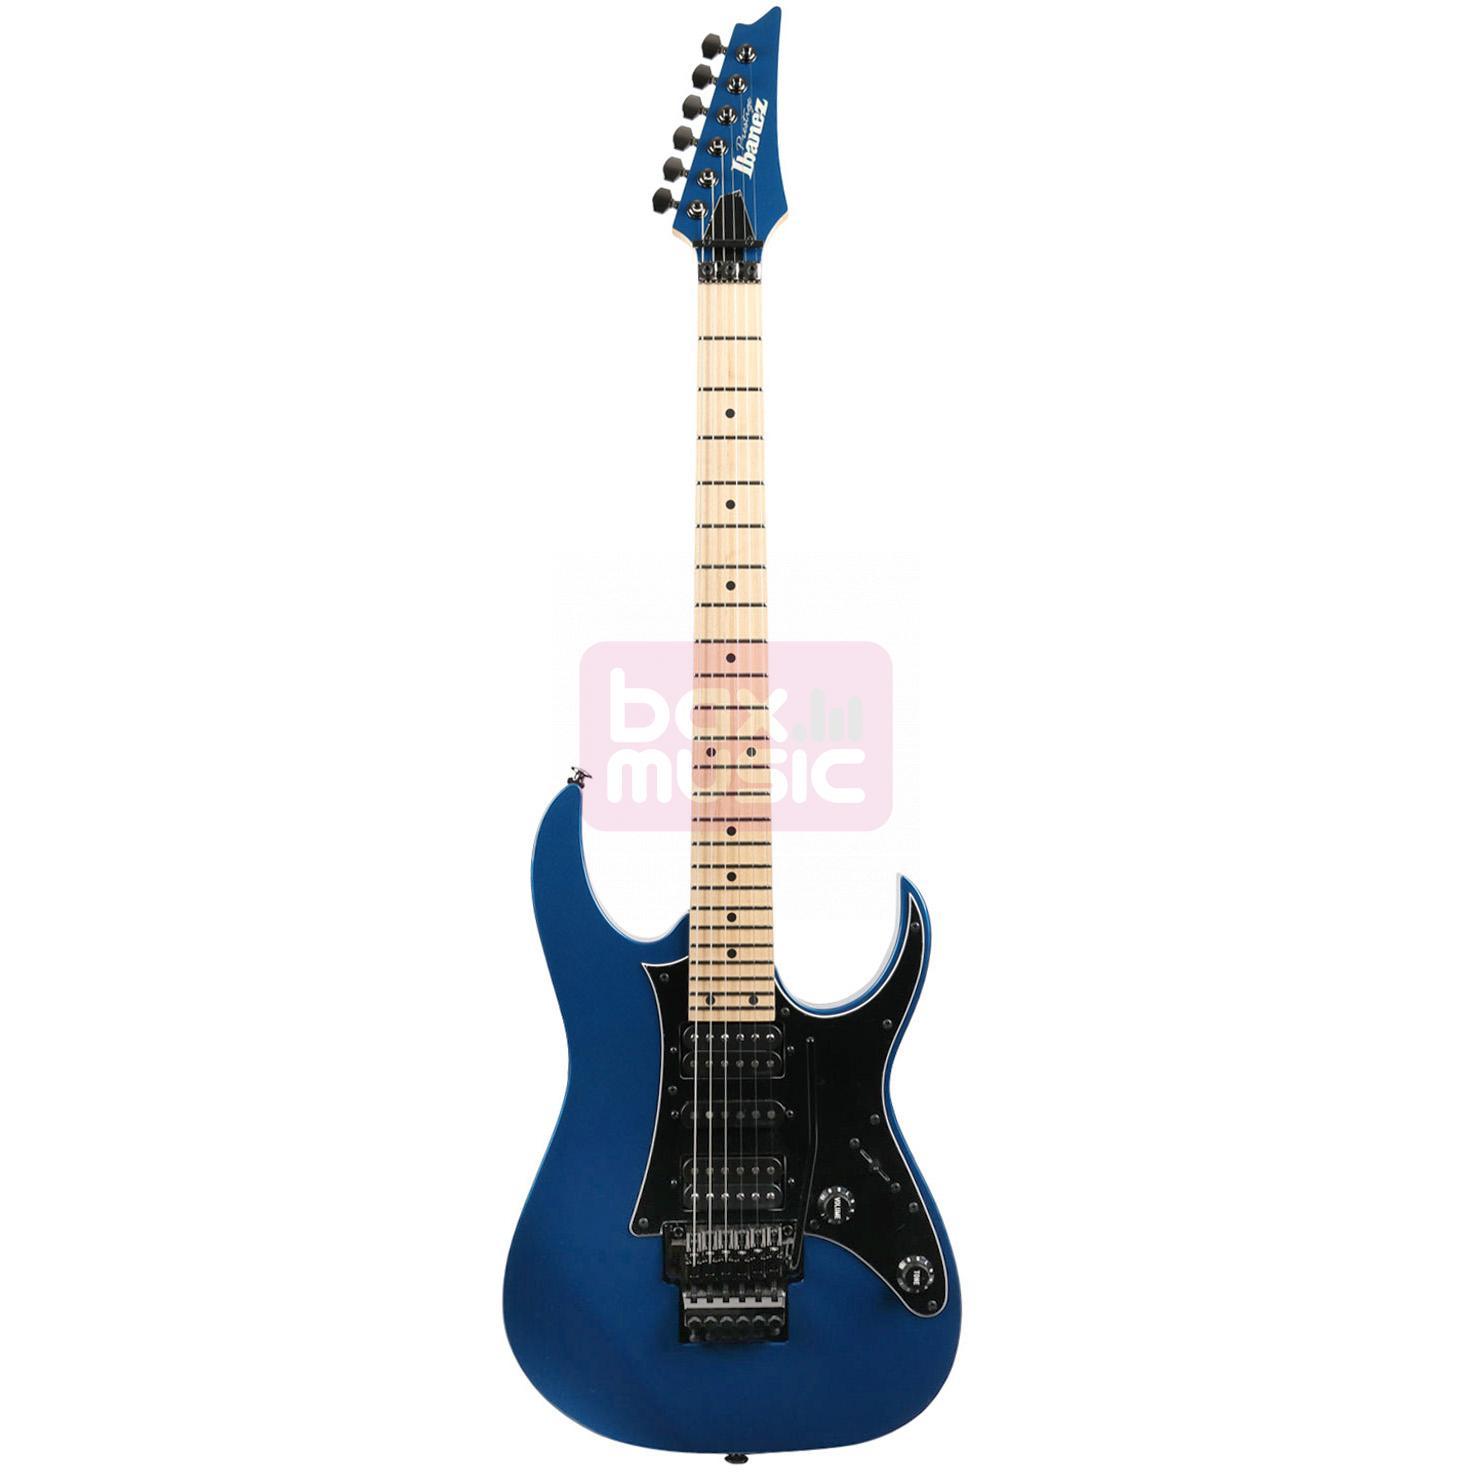 Ibanez RG655M Prestige Cobalt Blue Metallic